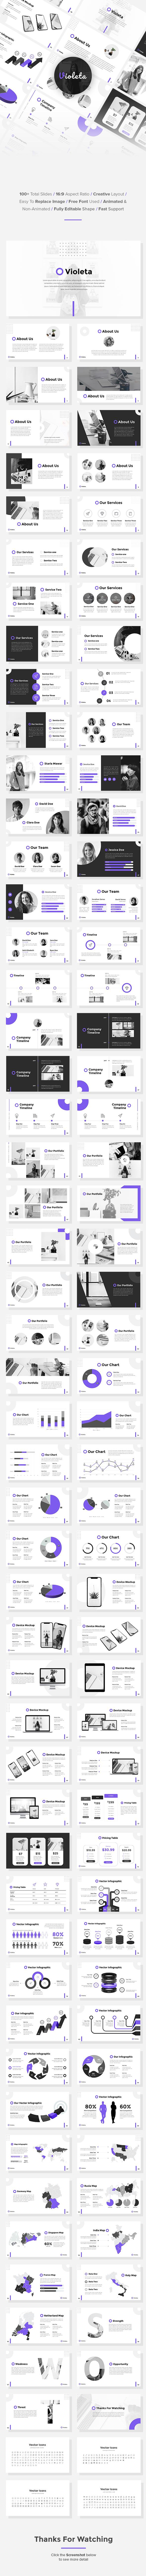 GraphicRiver Violeta StartUp Pitch Deck Keynote Template 20960763